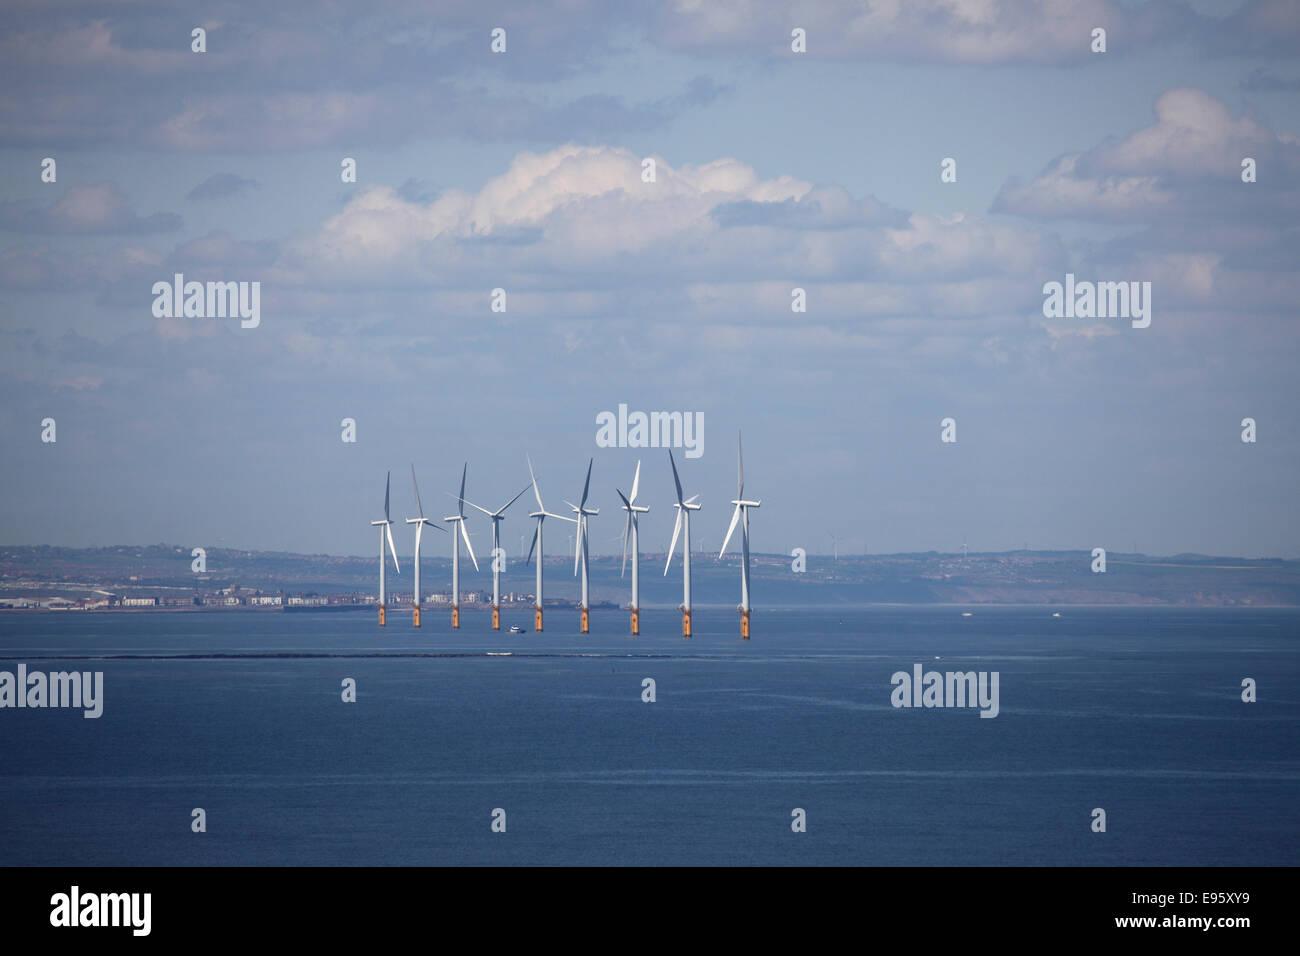 Teeside Offshore Wind Farm near Saltburn-by-the-Sea, United Kingdom. - Stock Image